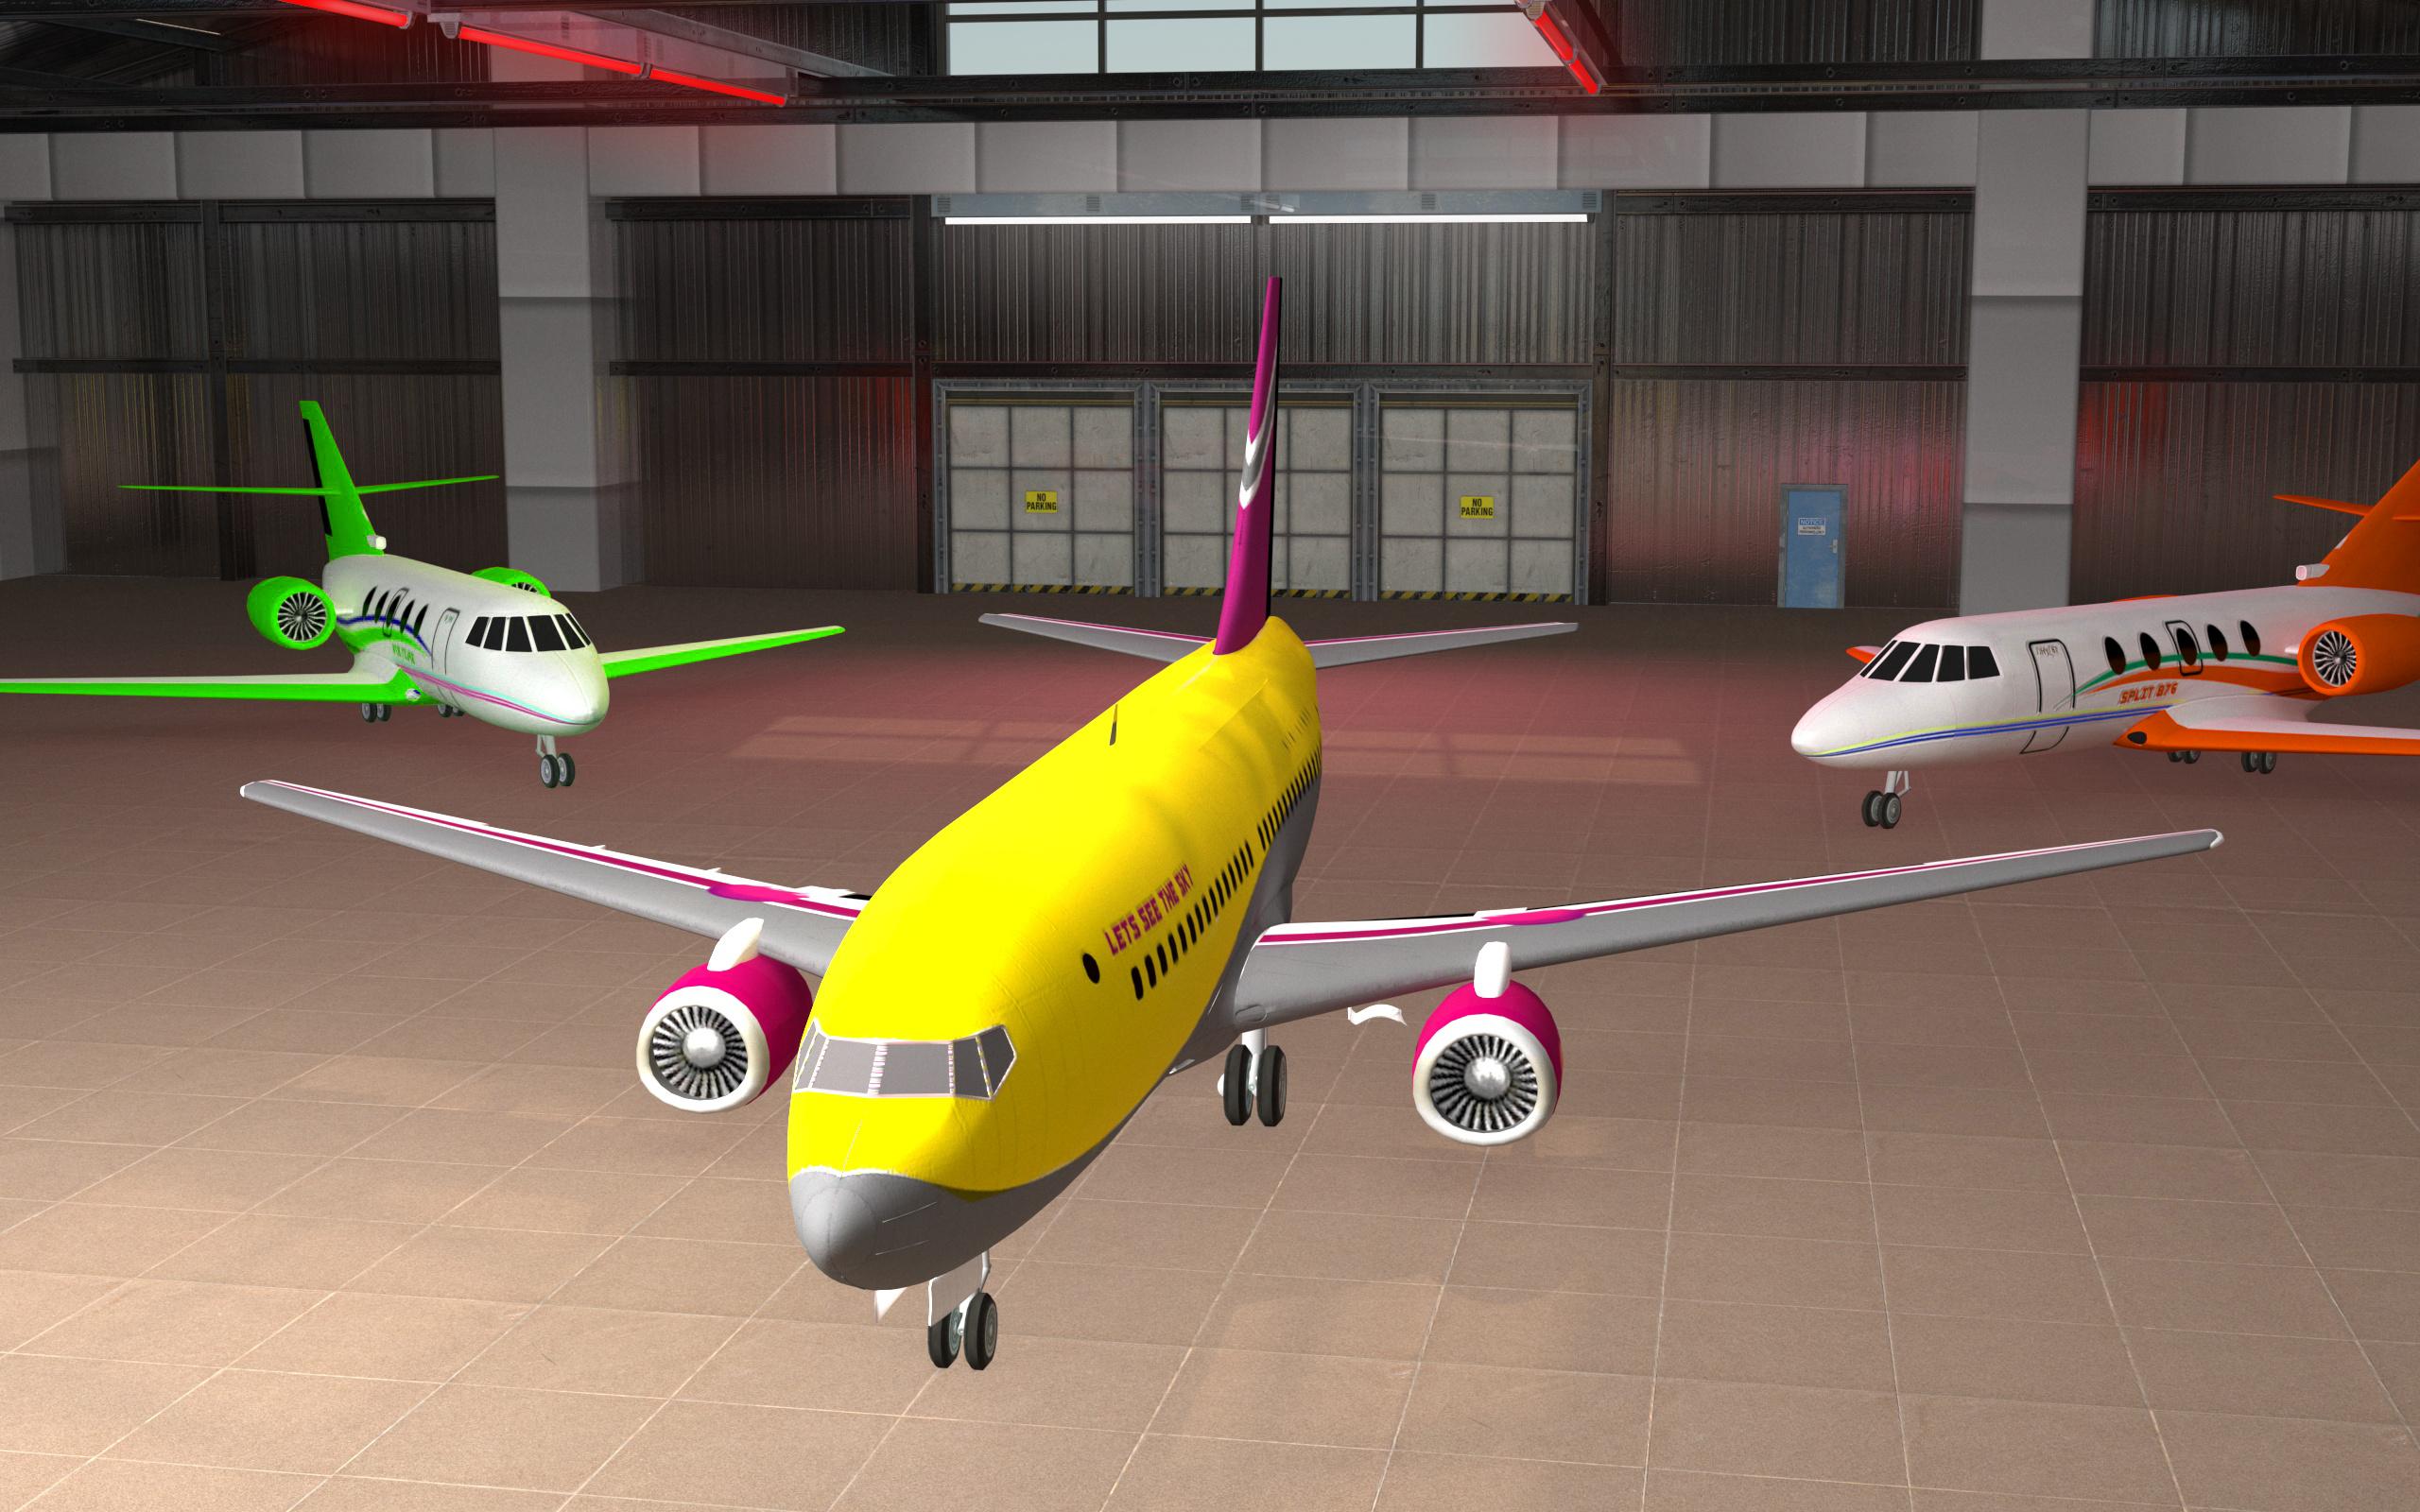 Flying Air Plane Simulator 3d - Pilot Plane Game